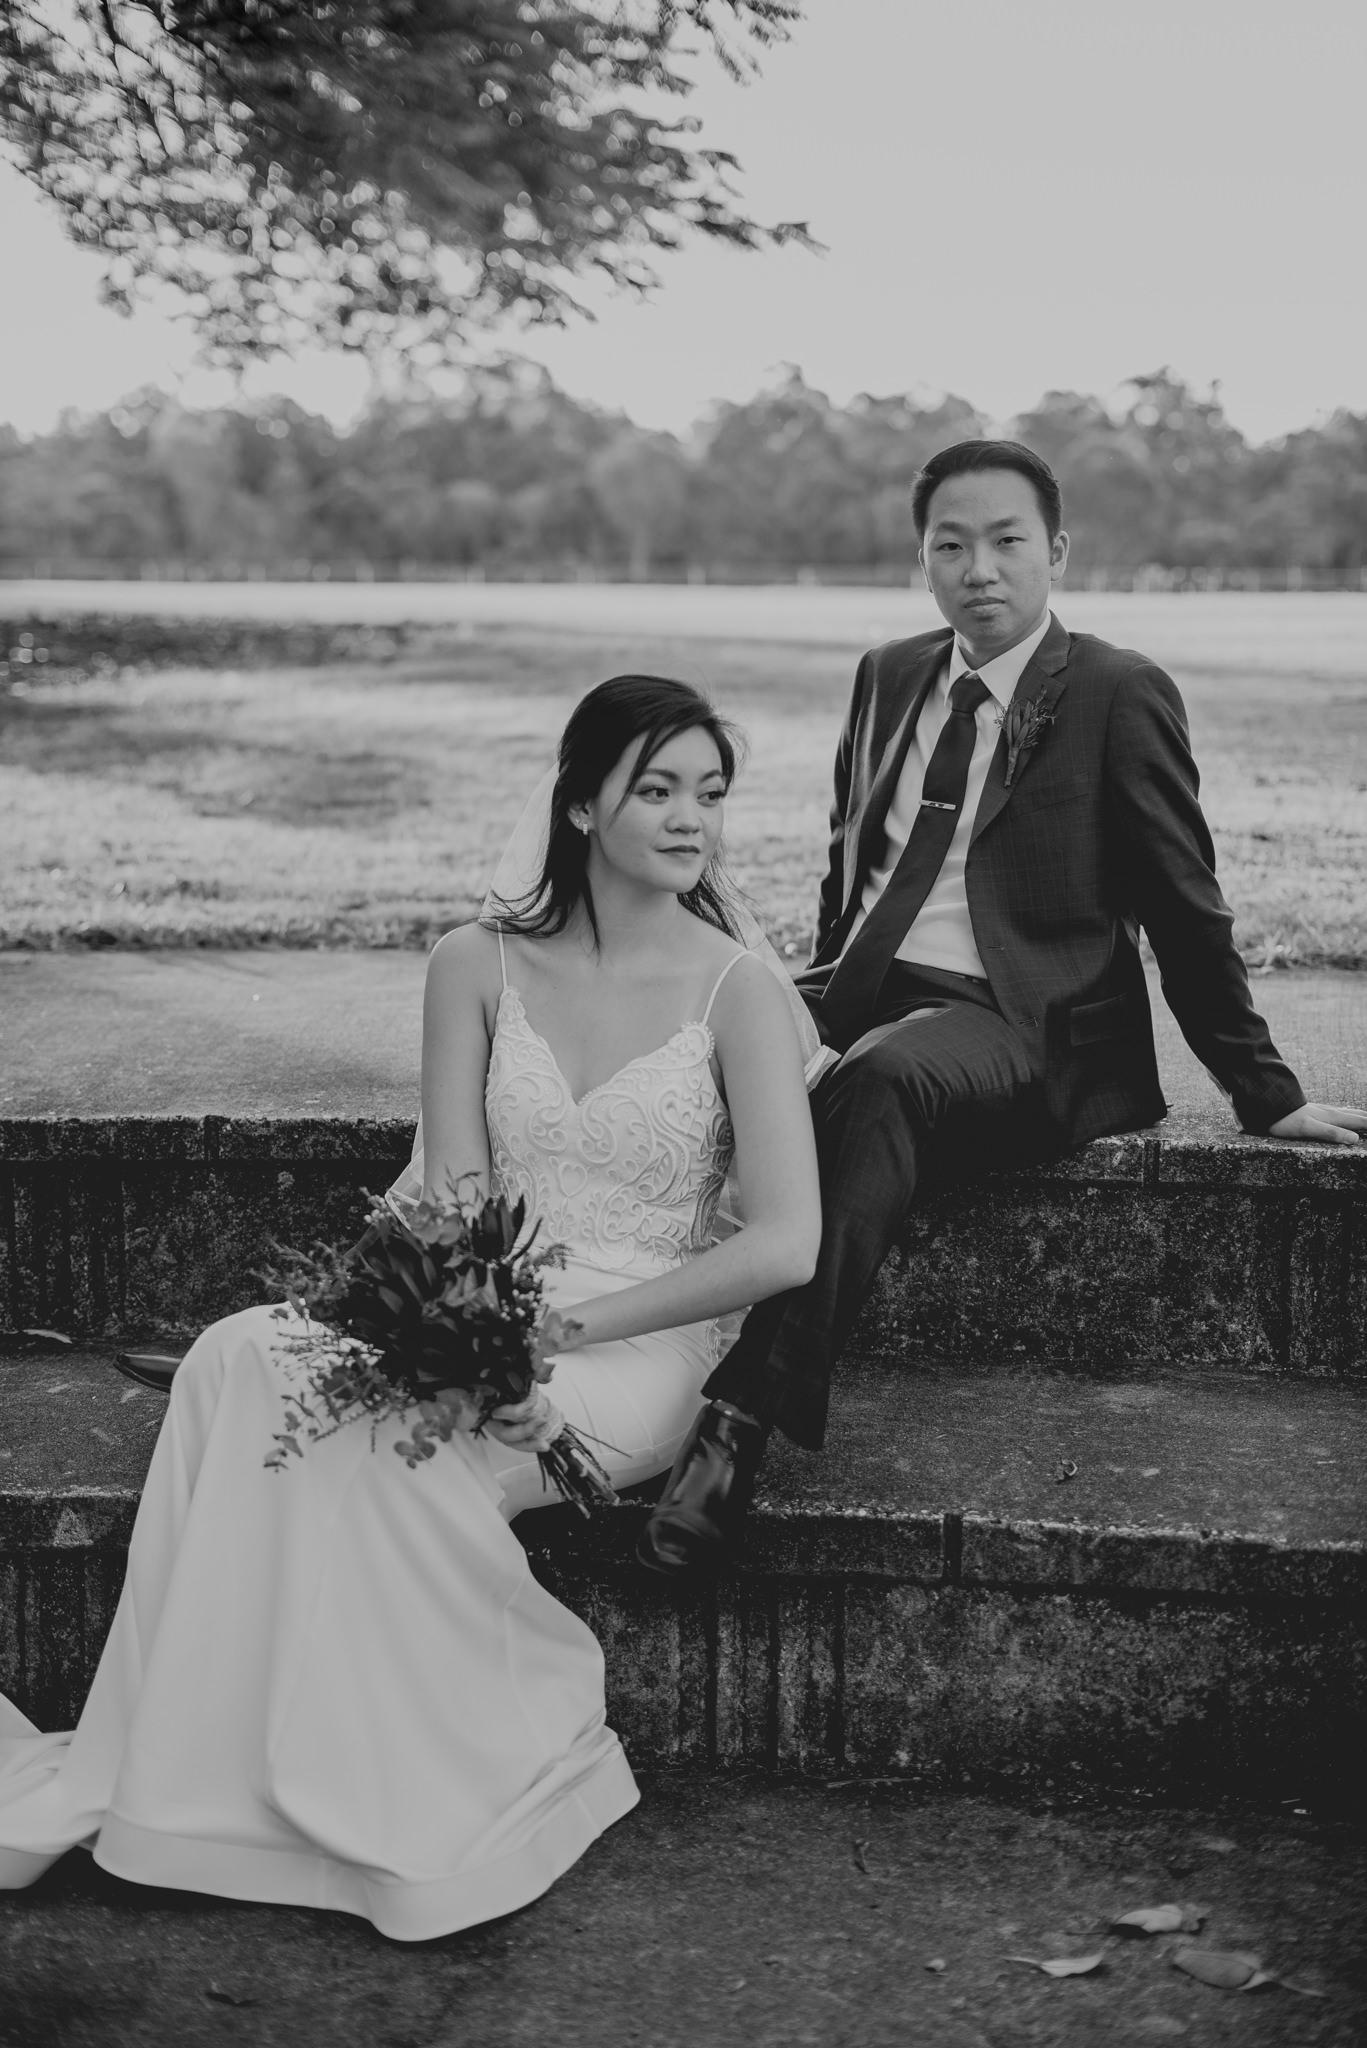 A bride and groom sit on concrete steps for a bridal portrait